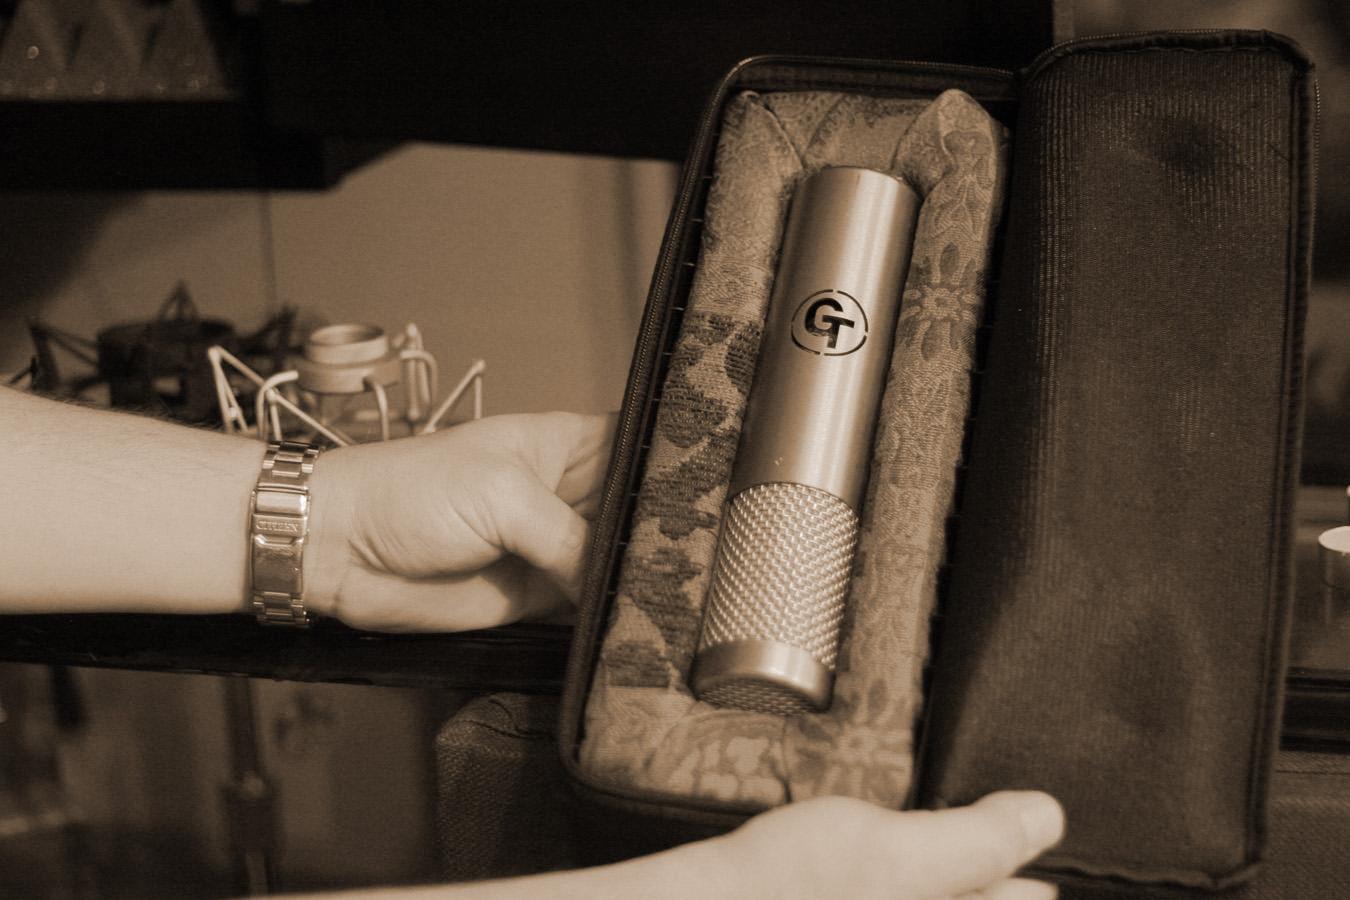 Original Groove Tube Model 1